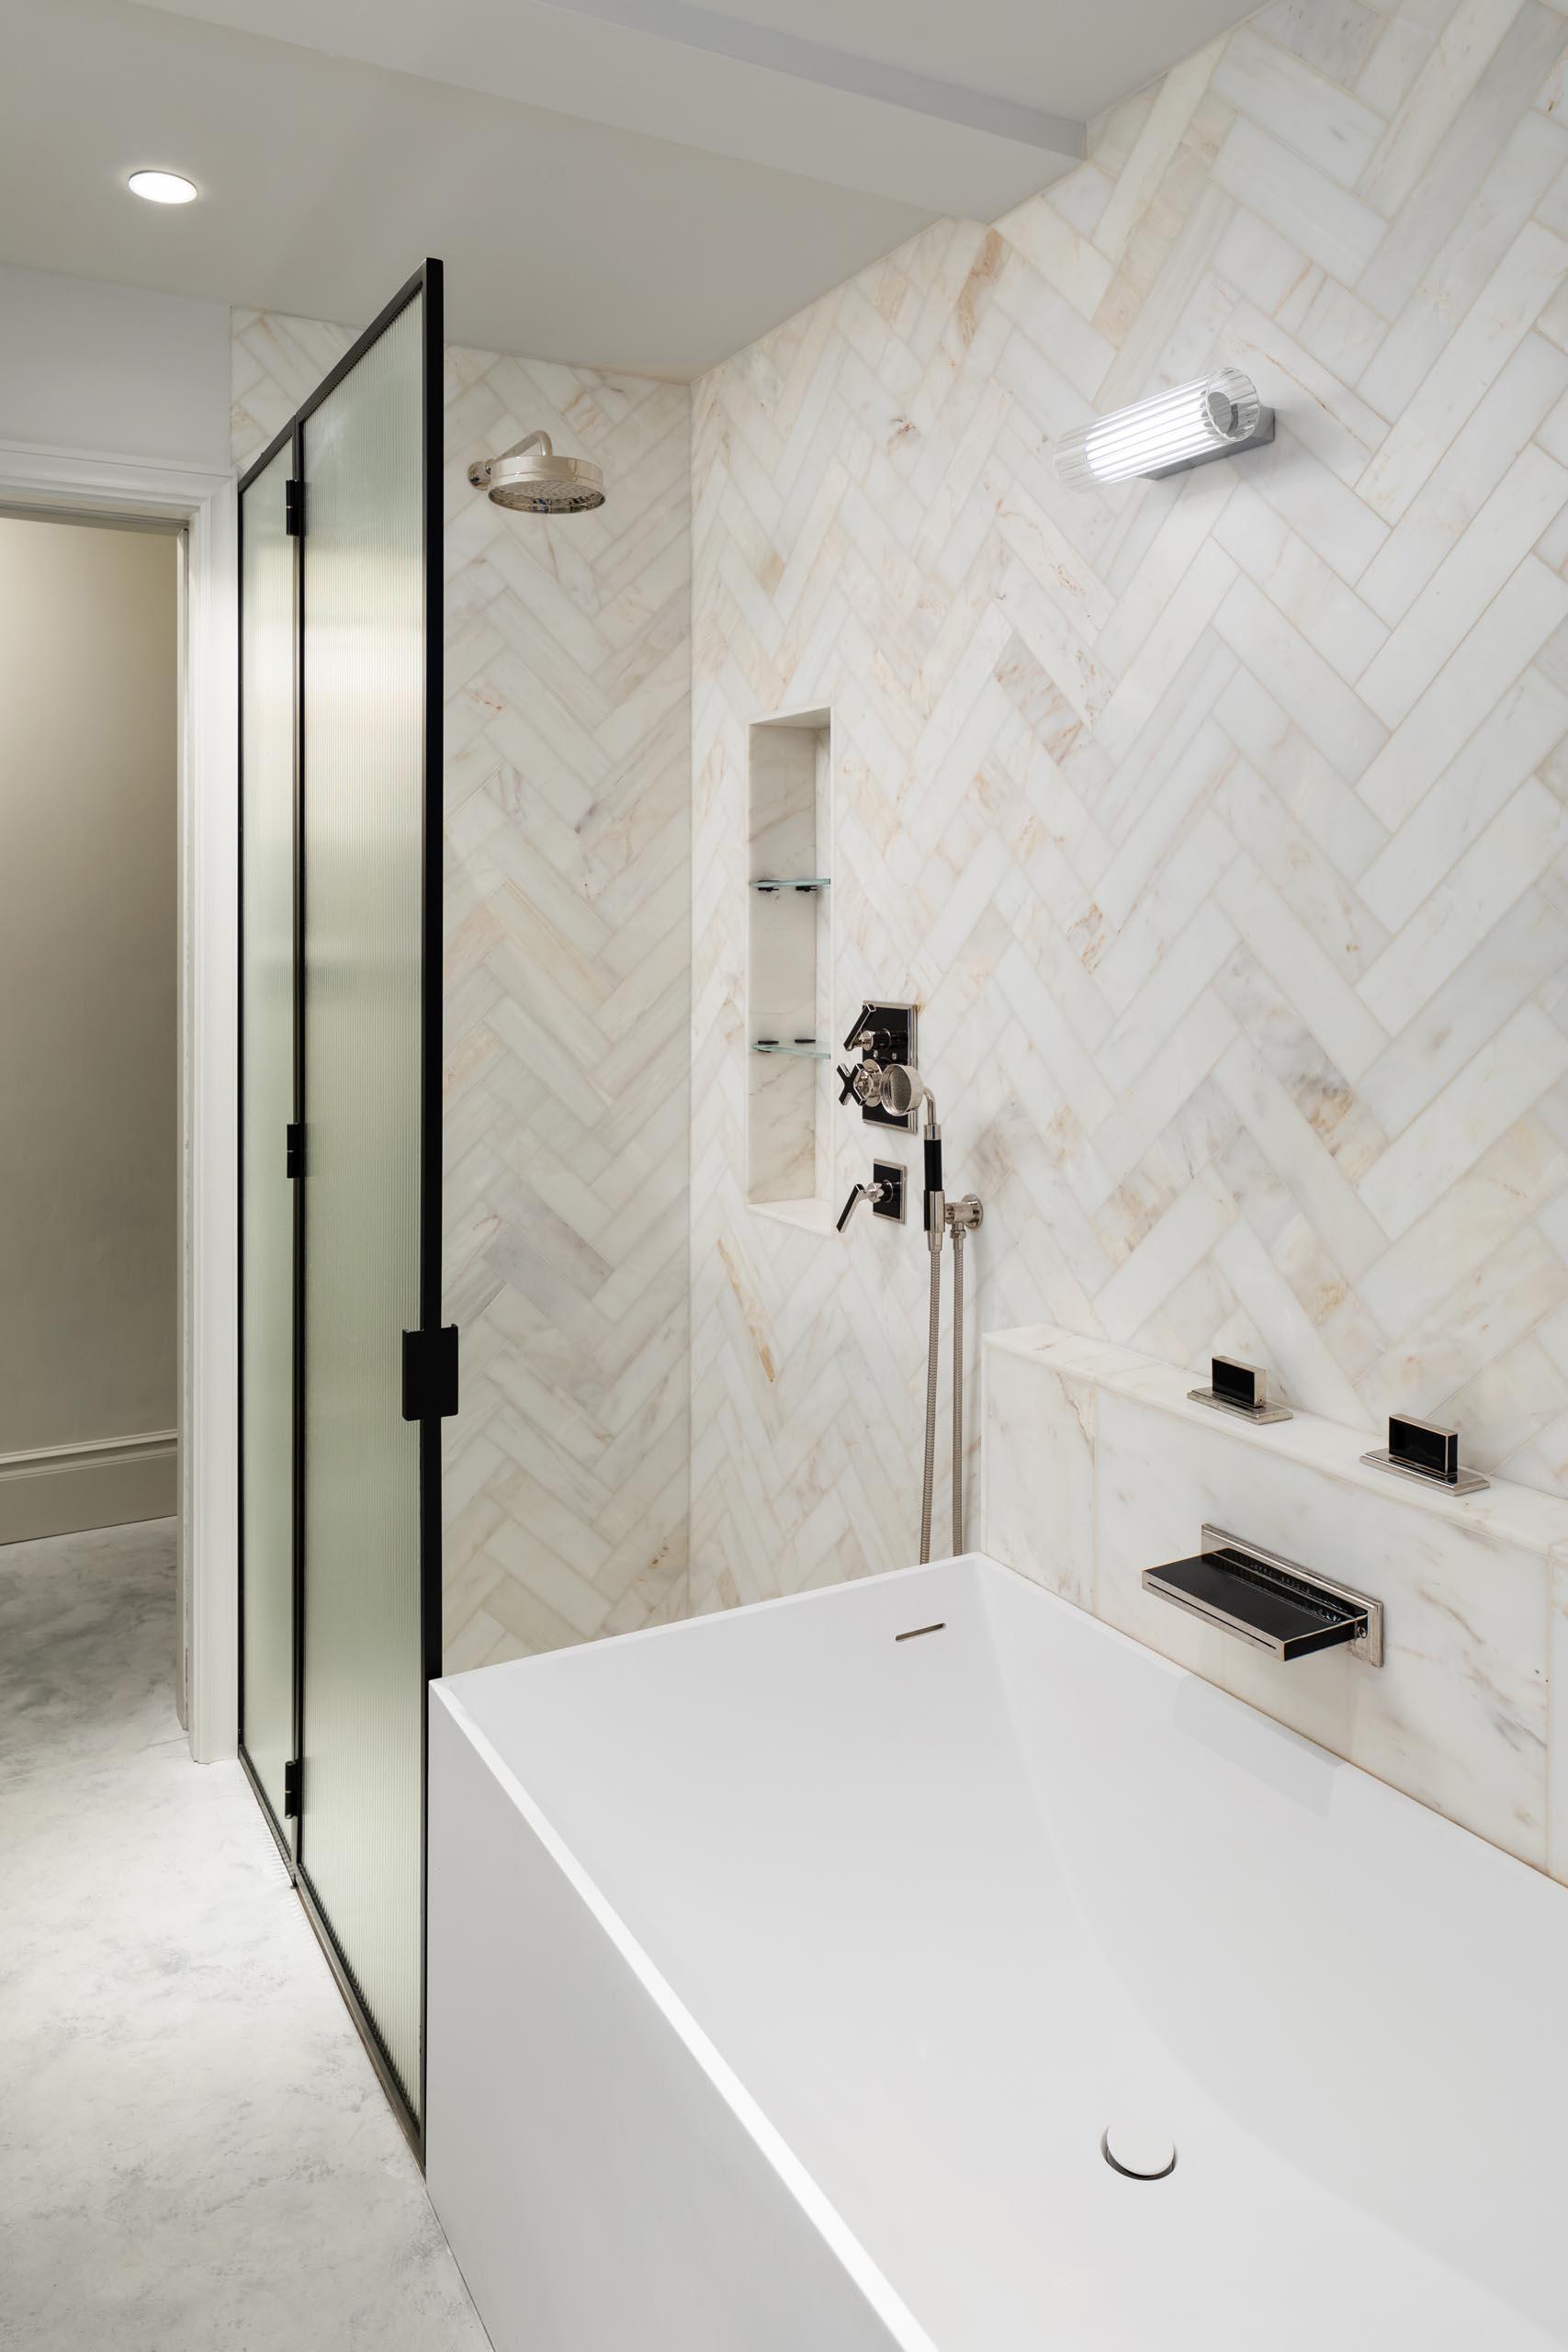 A modern bathroom with a walk-in shower that meets the bathtub.